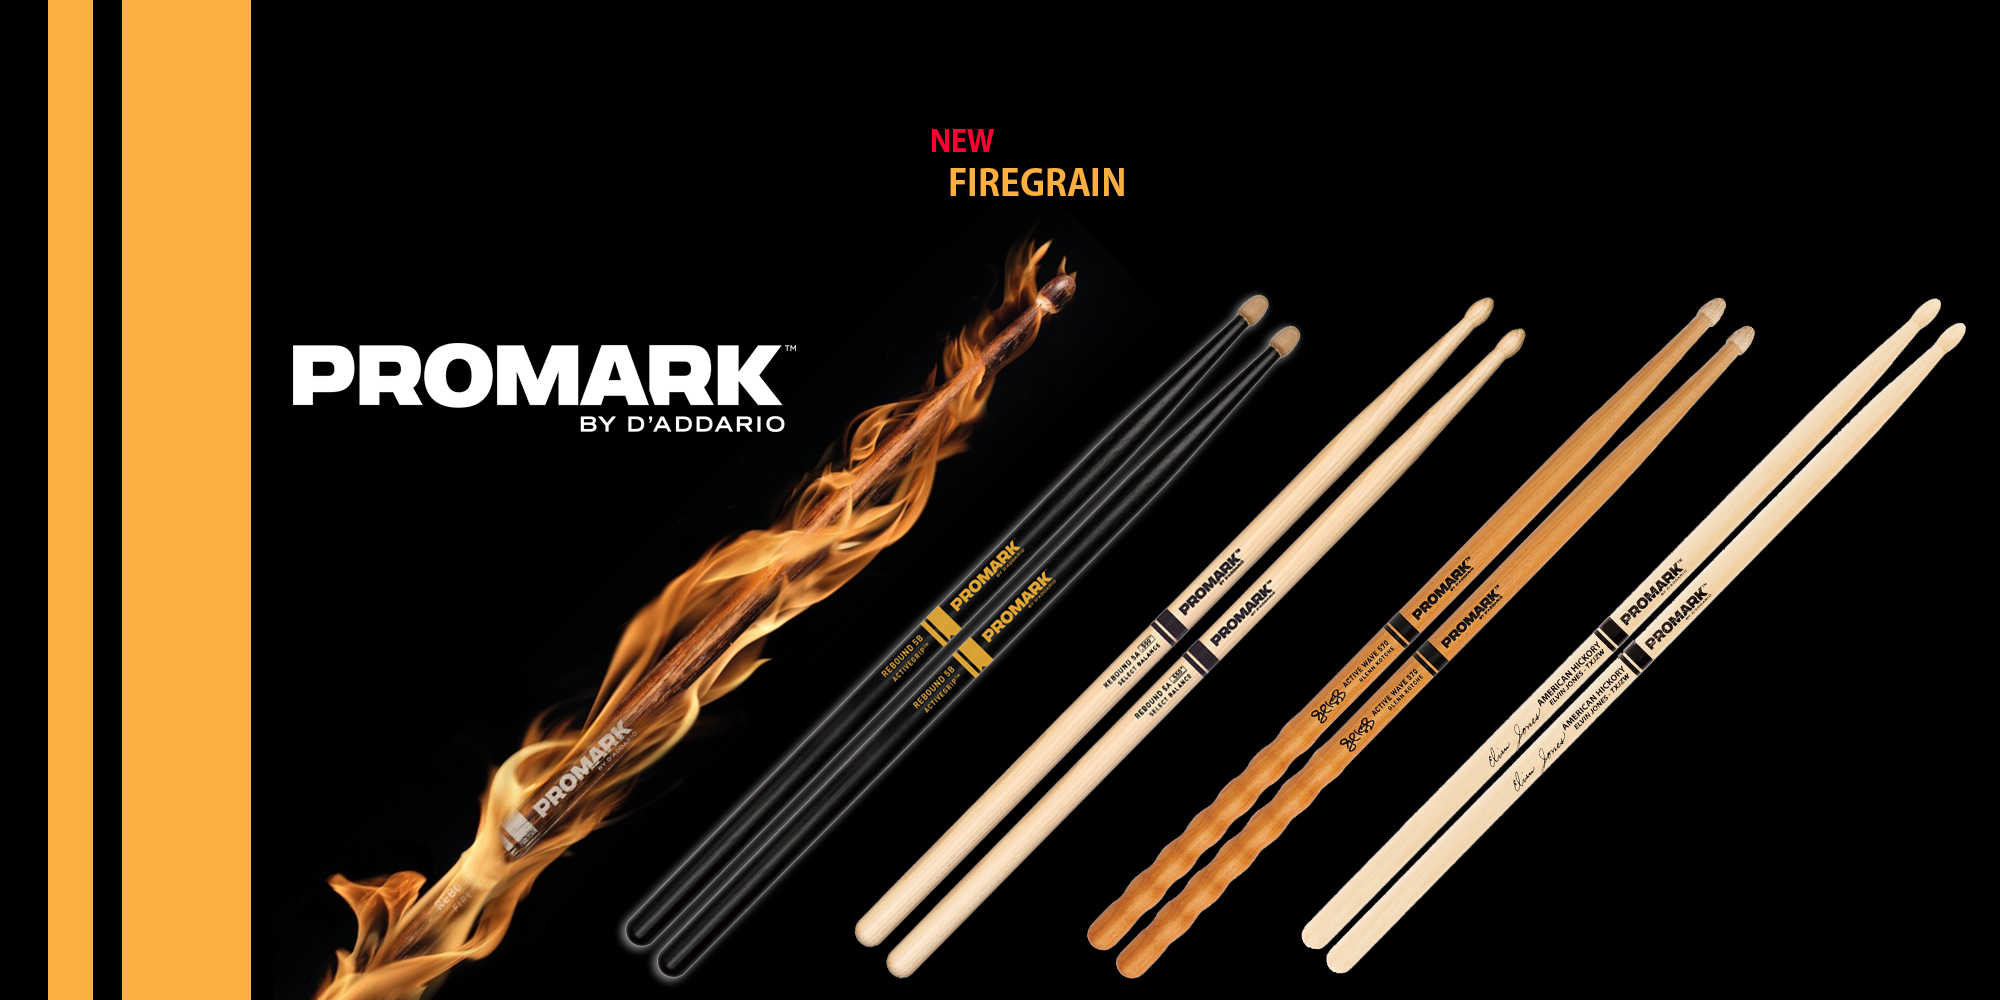 promark_image02